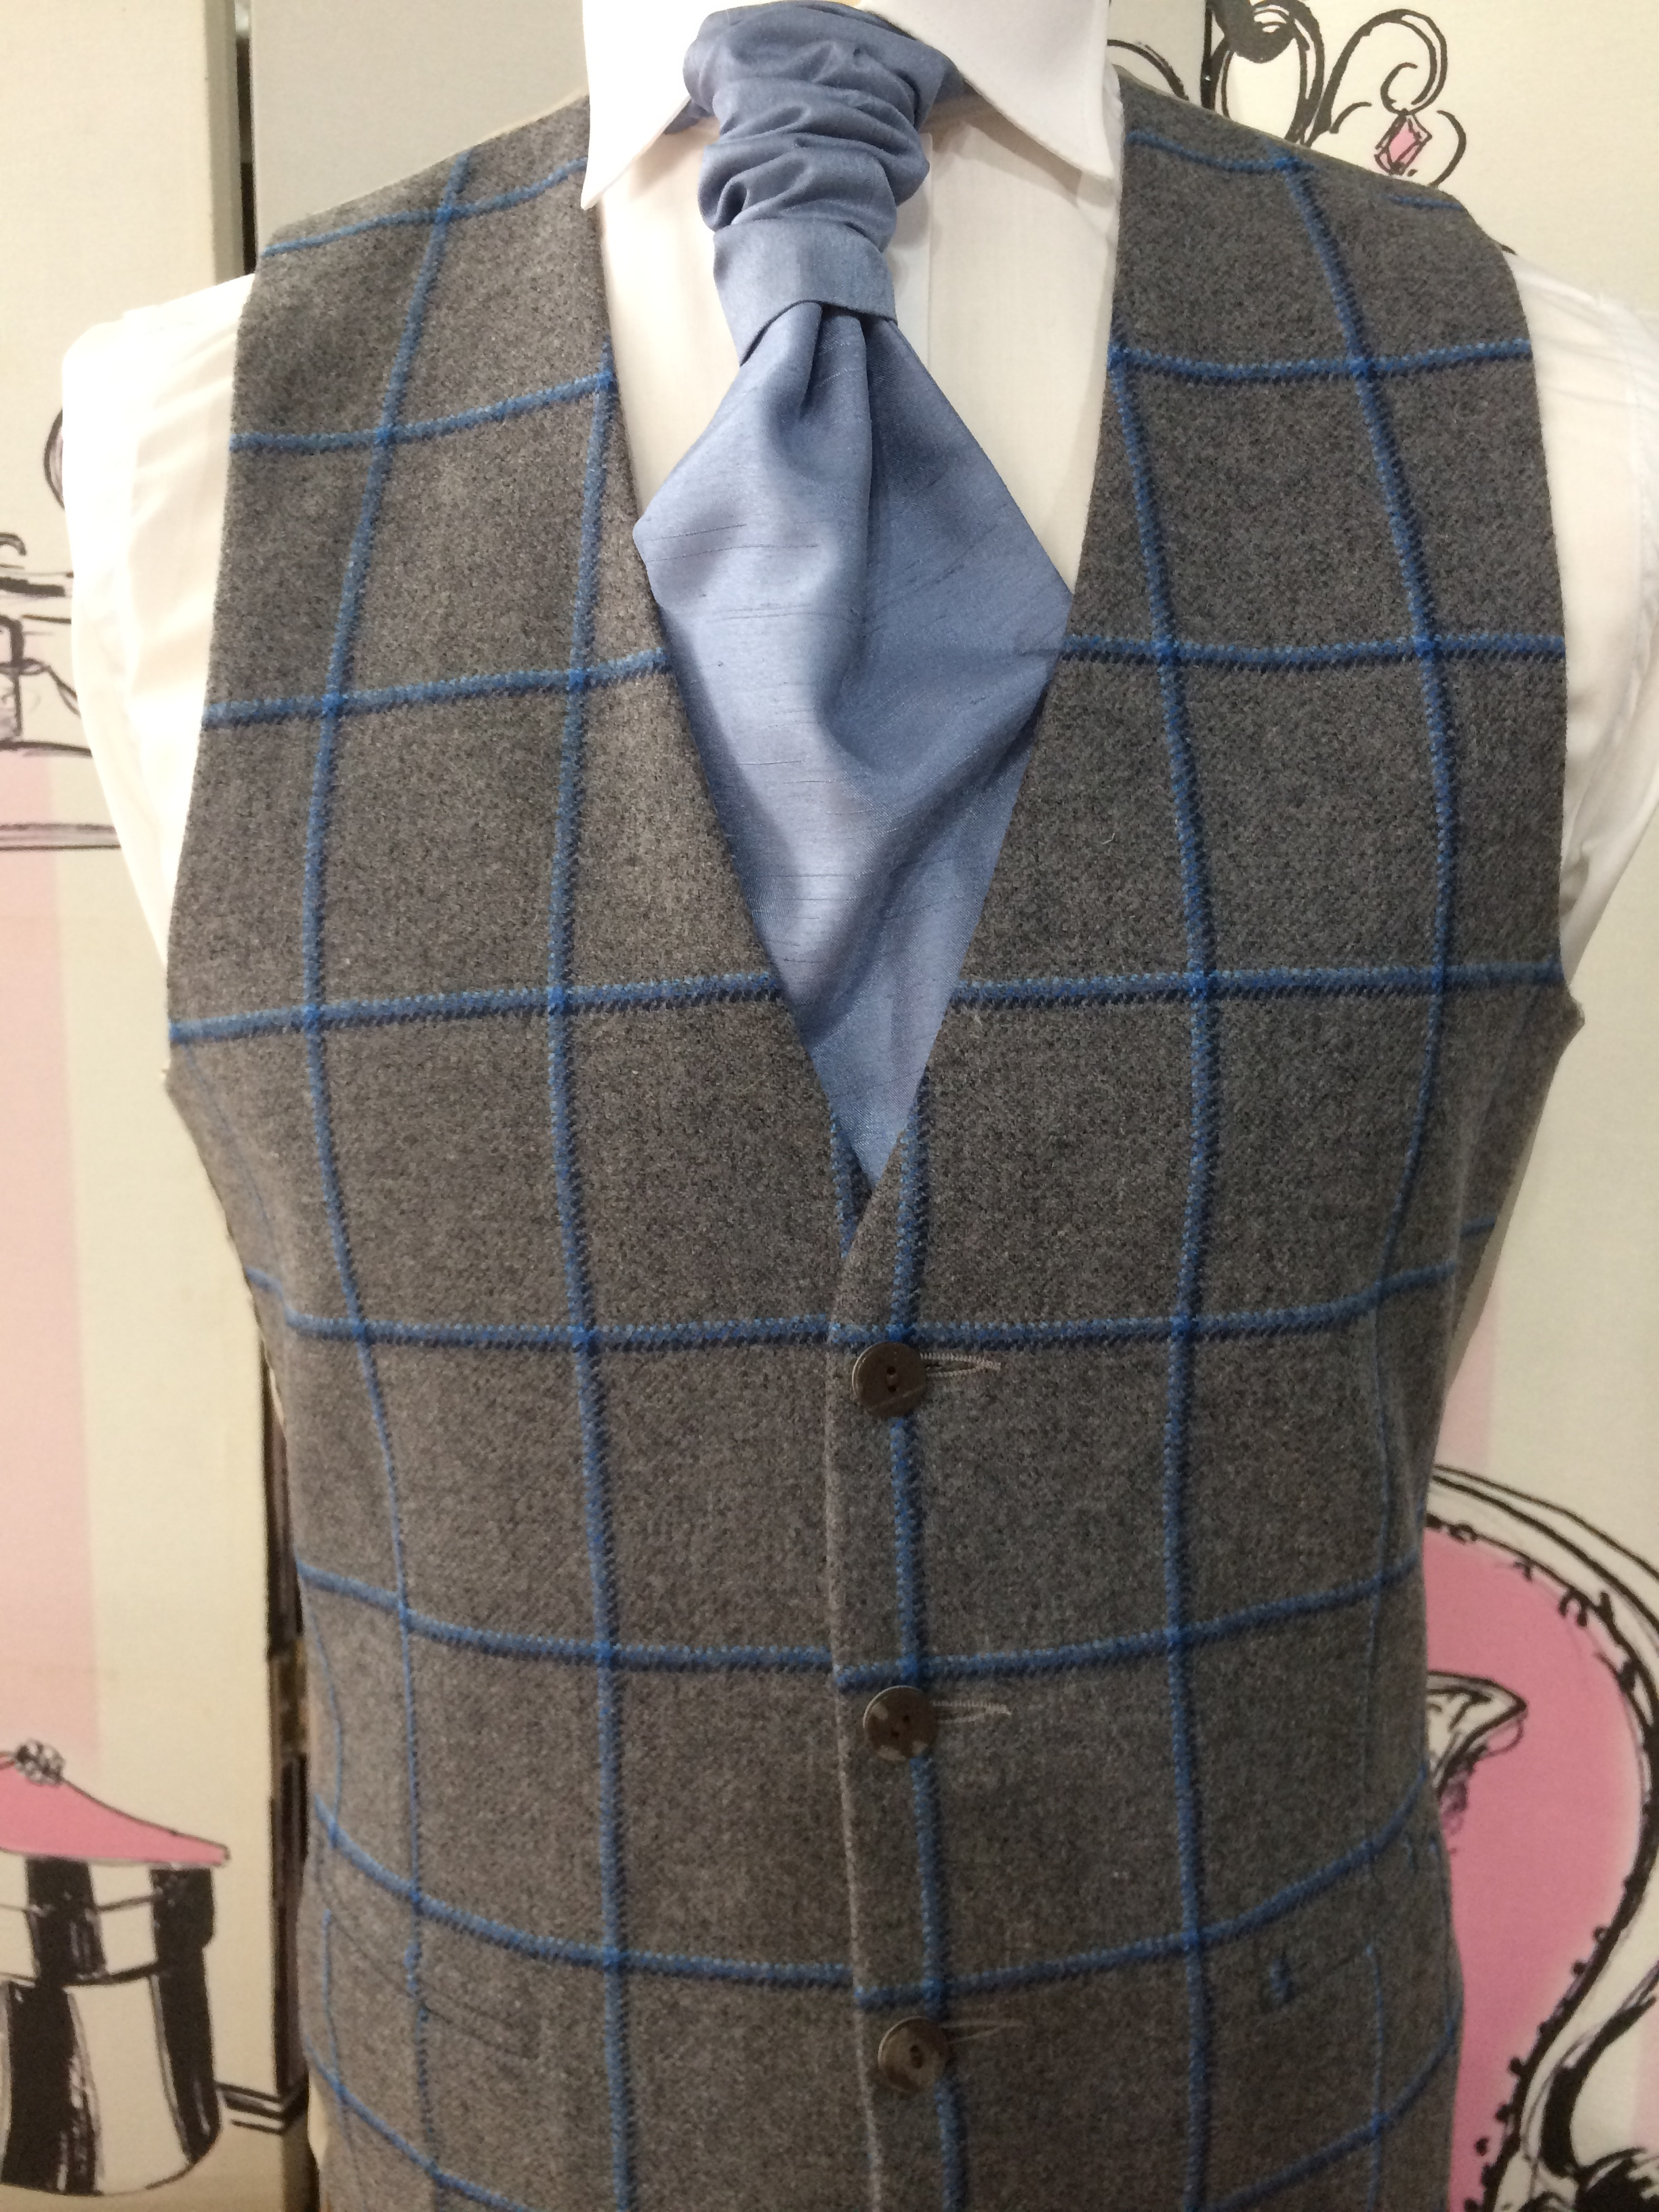 Two Blues & Grey Tweed